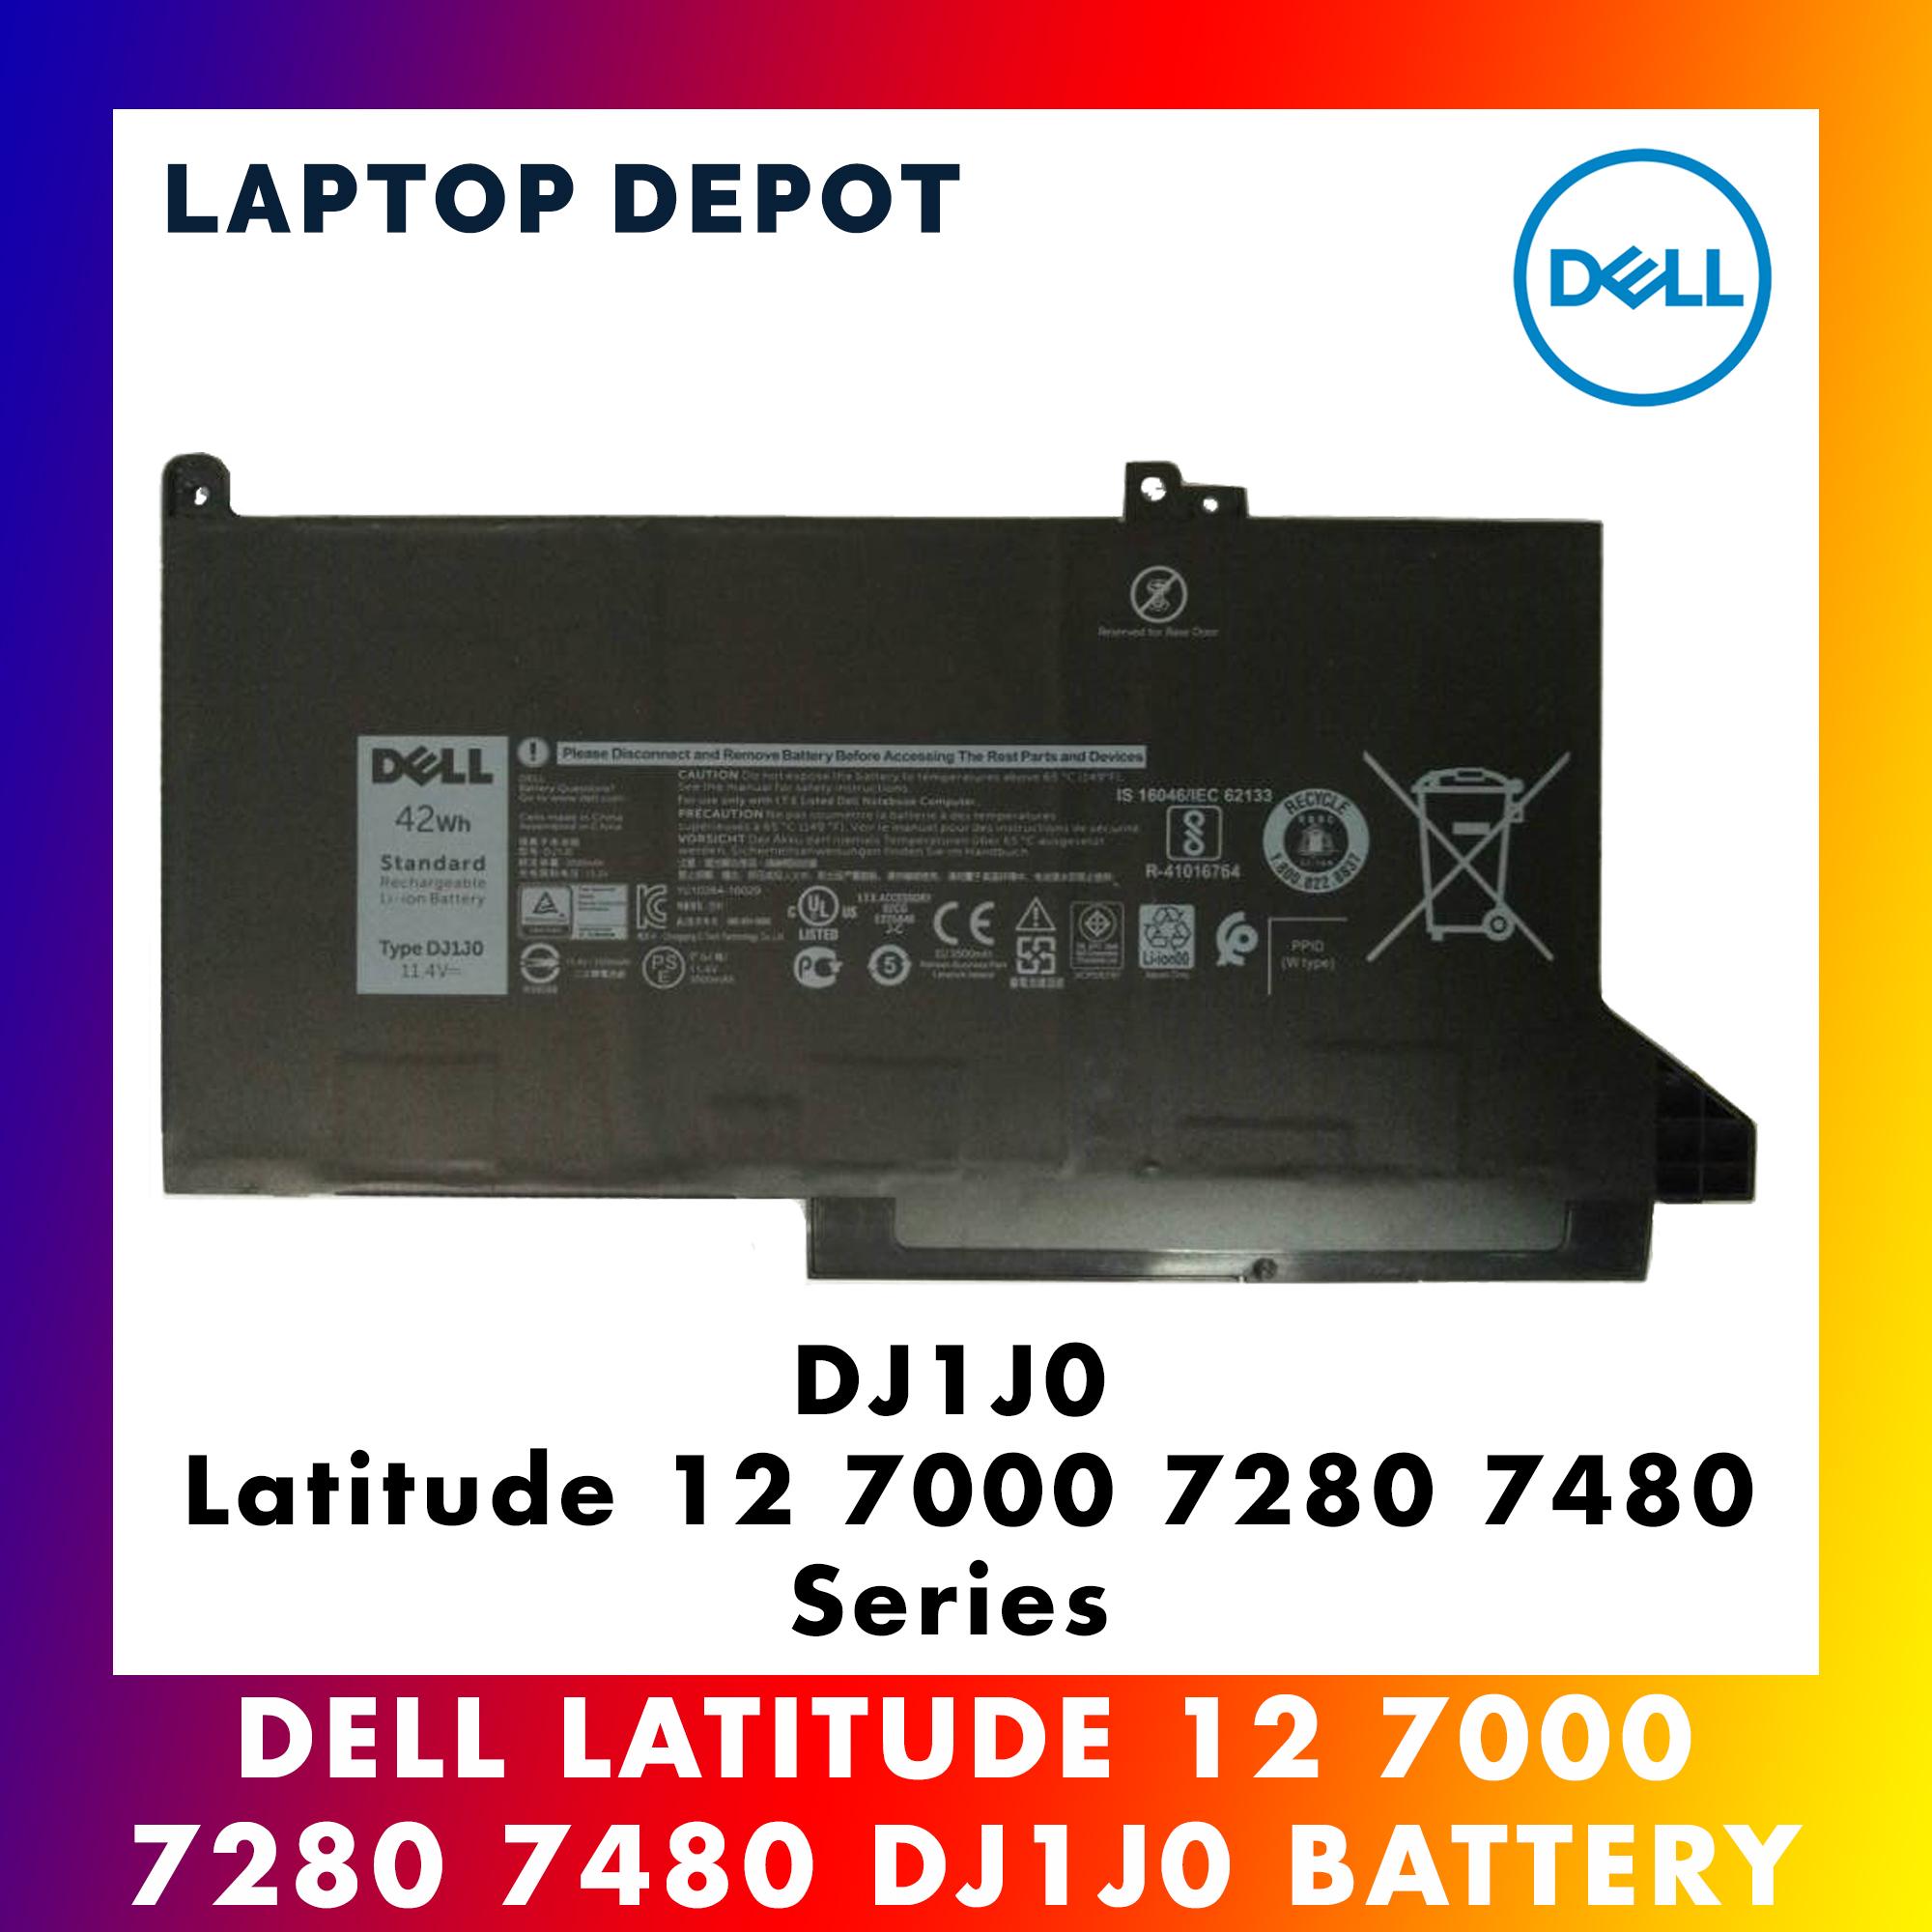 [100% ORIGINAL] Dell Latitude 12 7000 7280 7480 Series DJ1J0 Battery